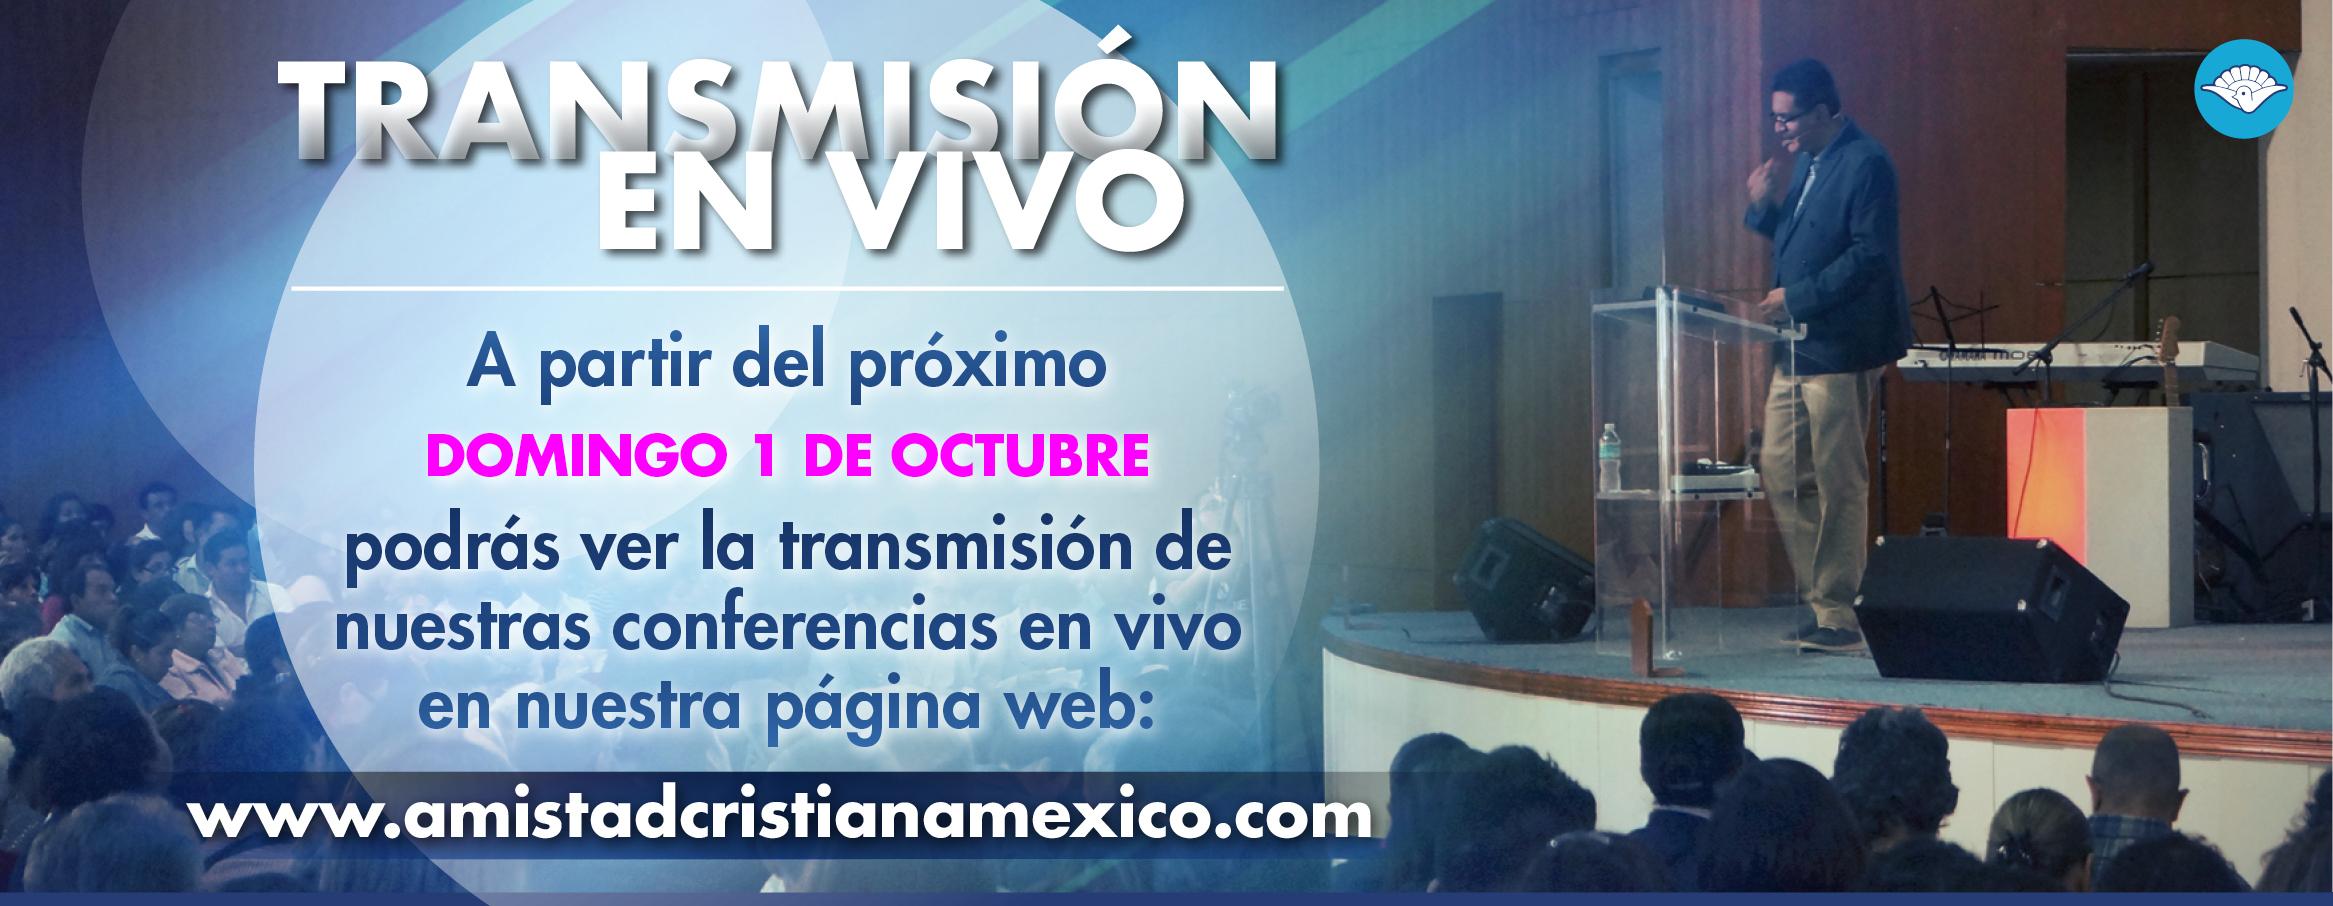 banner_SlideAC_20171001_Transmision_SitioWebAC